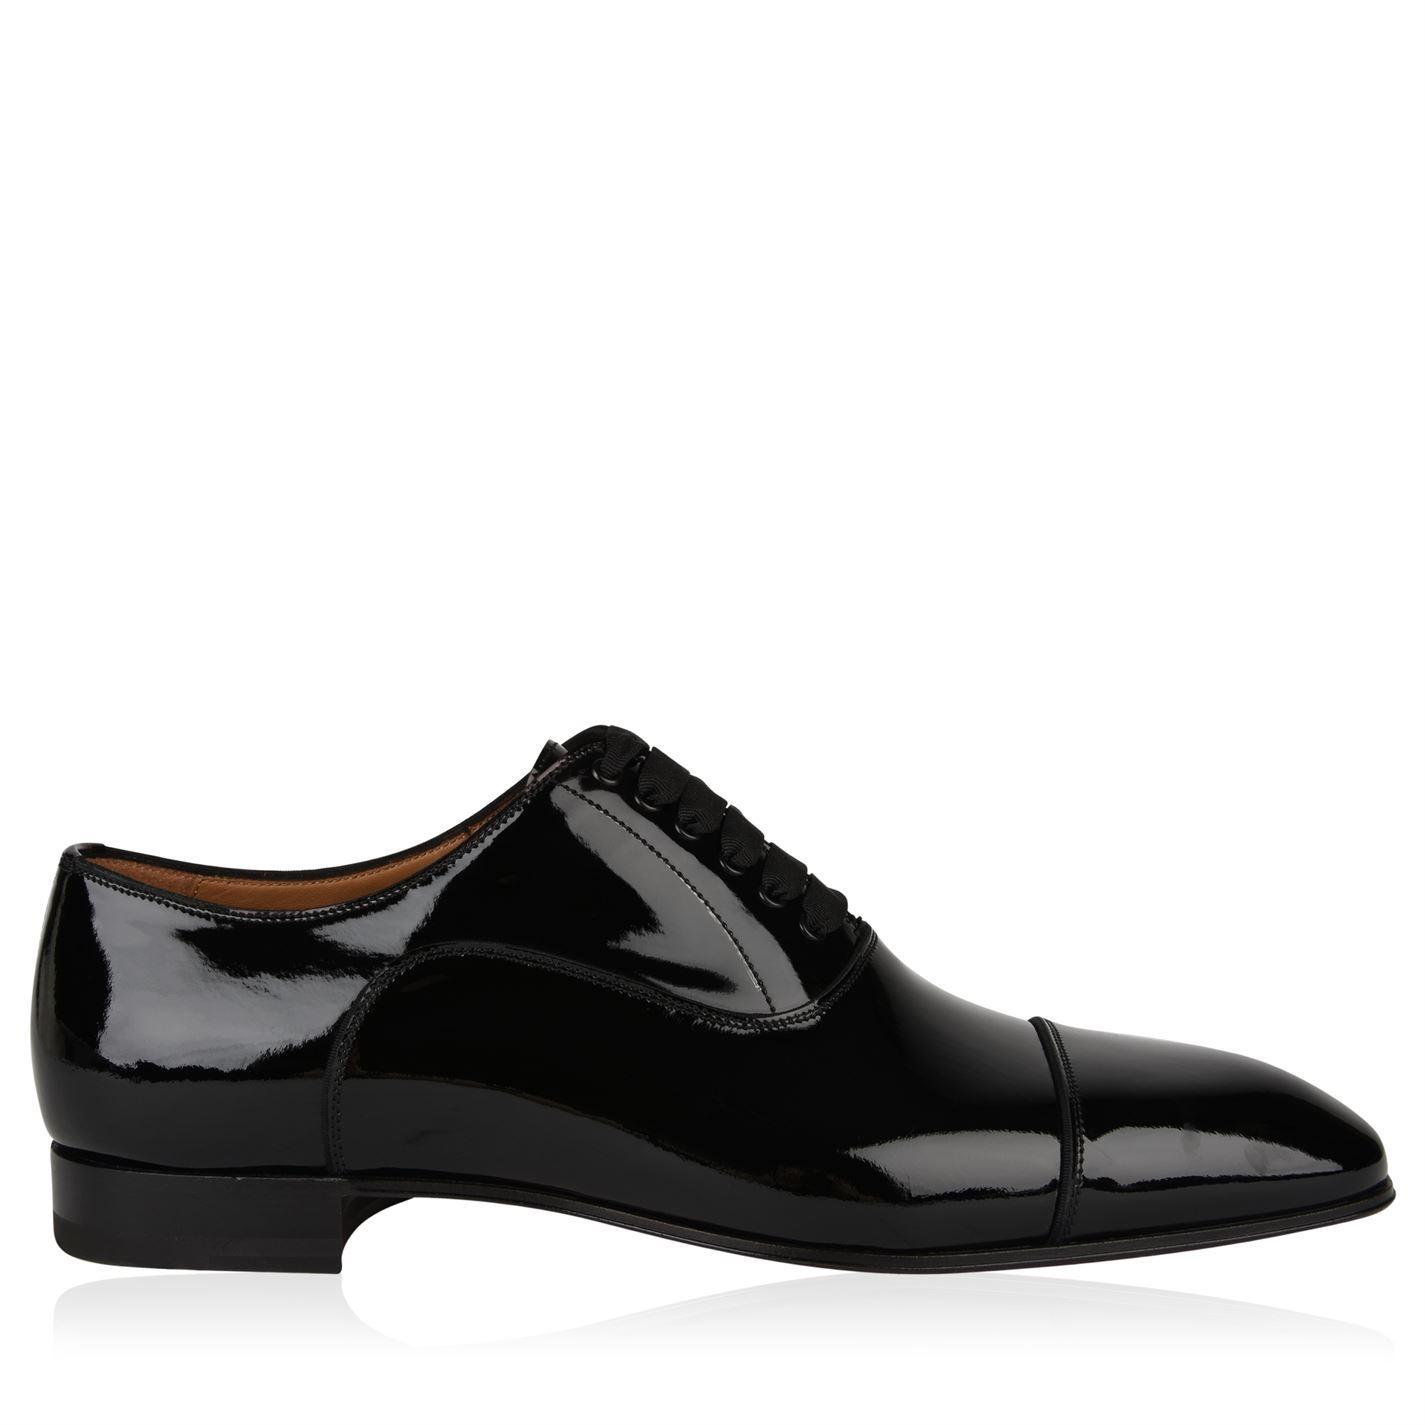 997691f175c5 Christian Louboutin Greggo Patent Shoes in Black for Men - Lyst